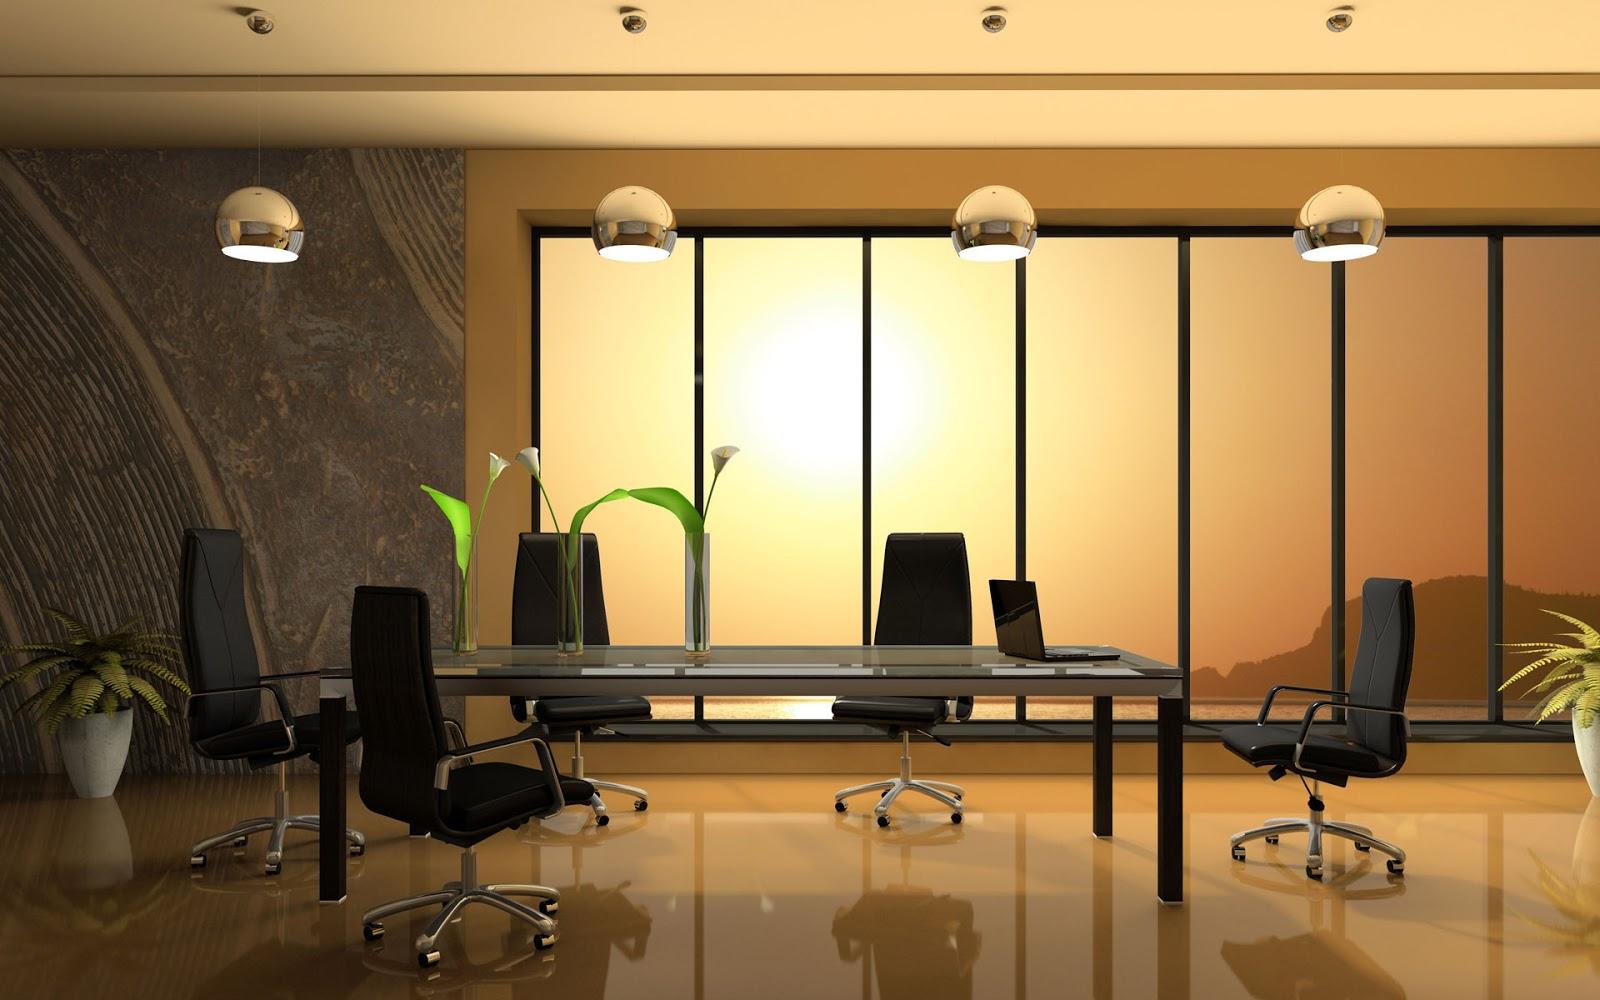 fresh hd wallpapers interior design fresh hd wallpapers 2013 - Wall Paper Interior Design